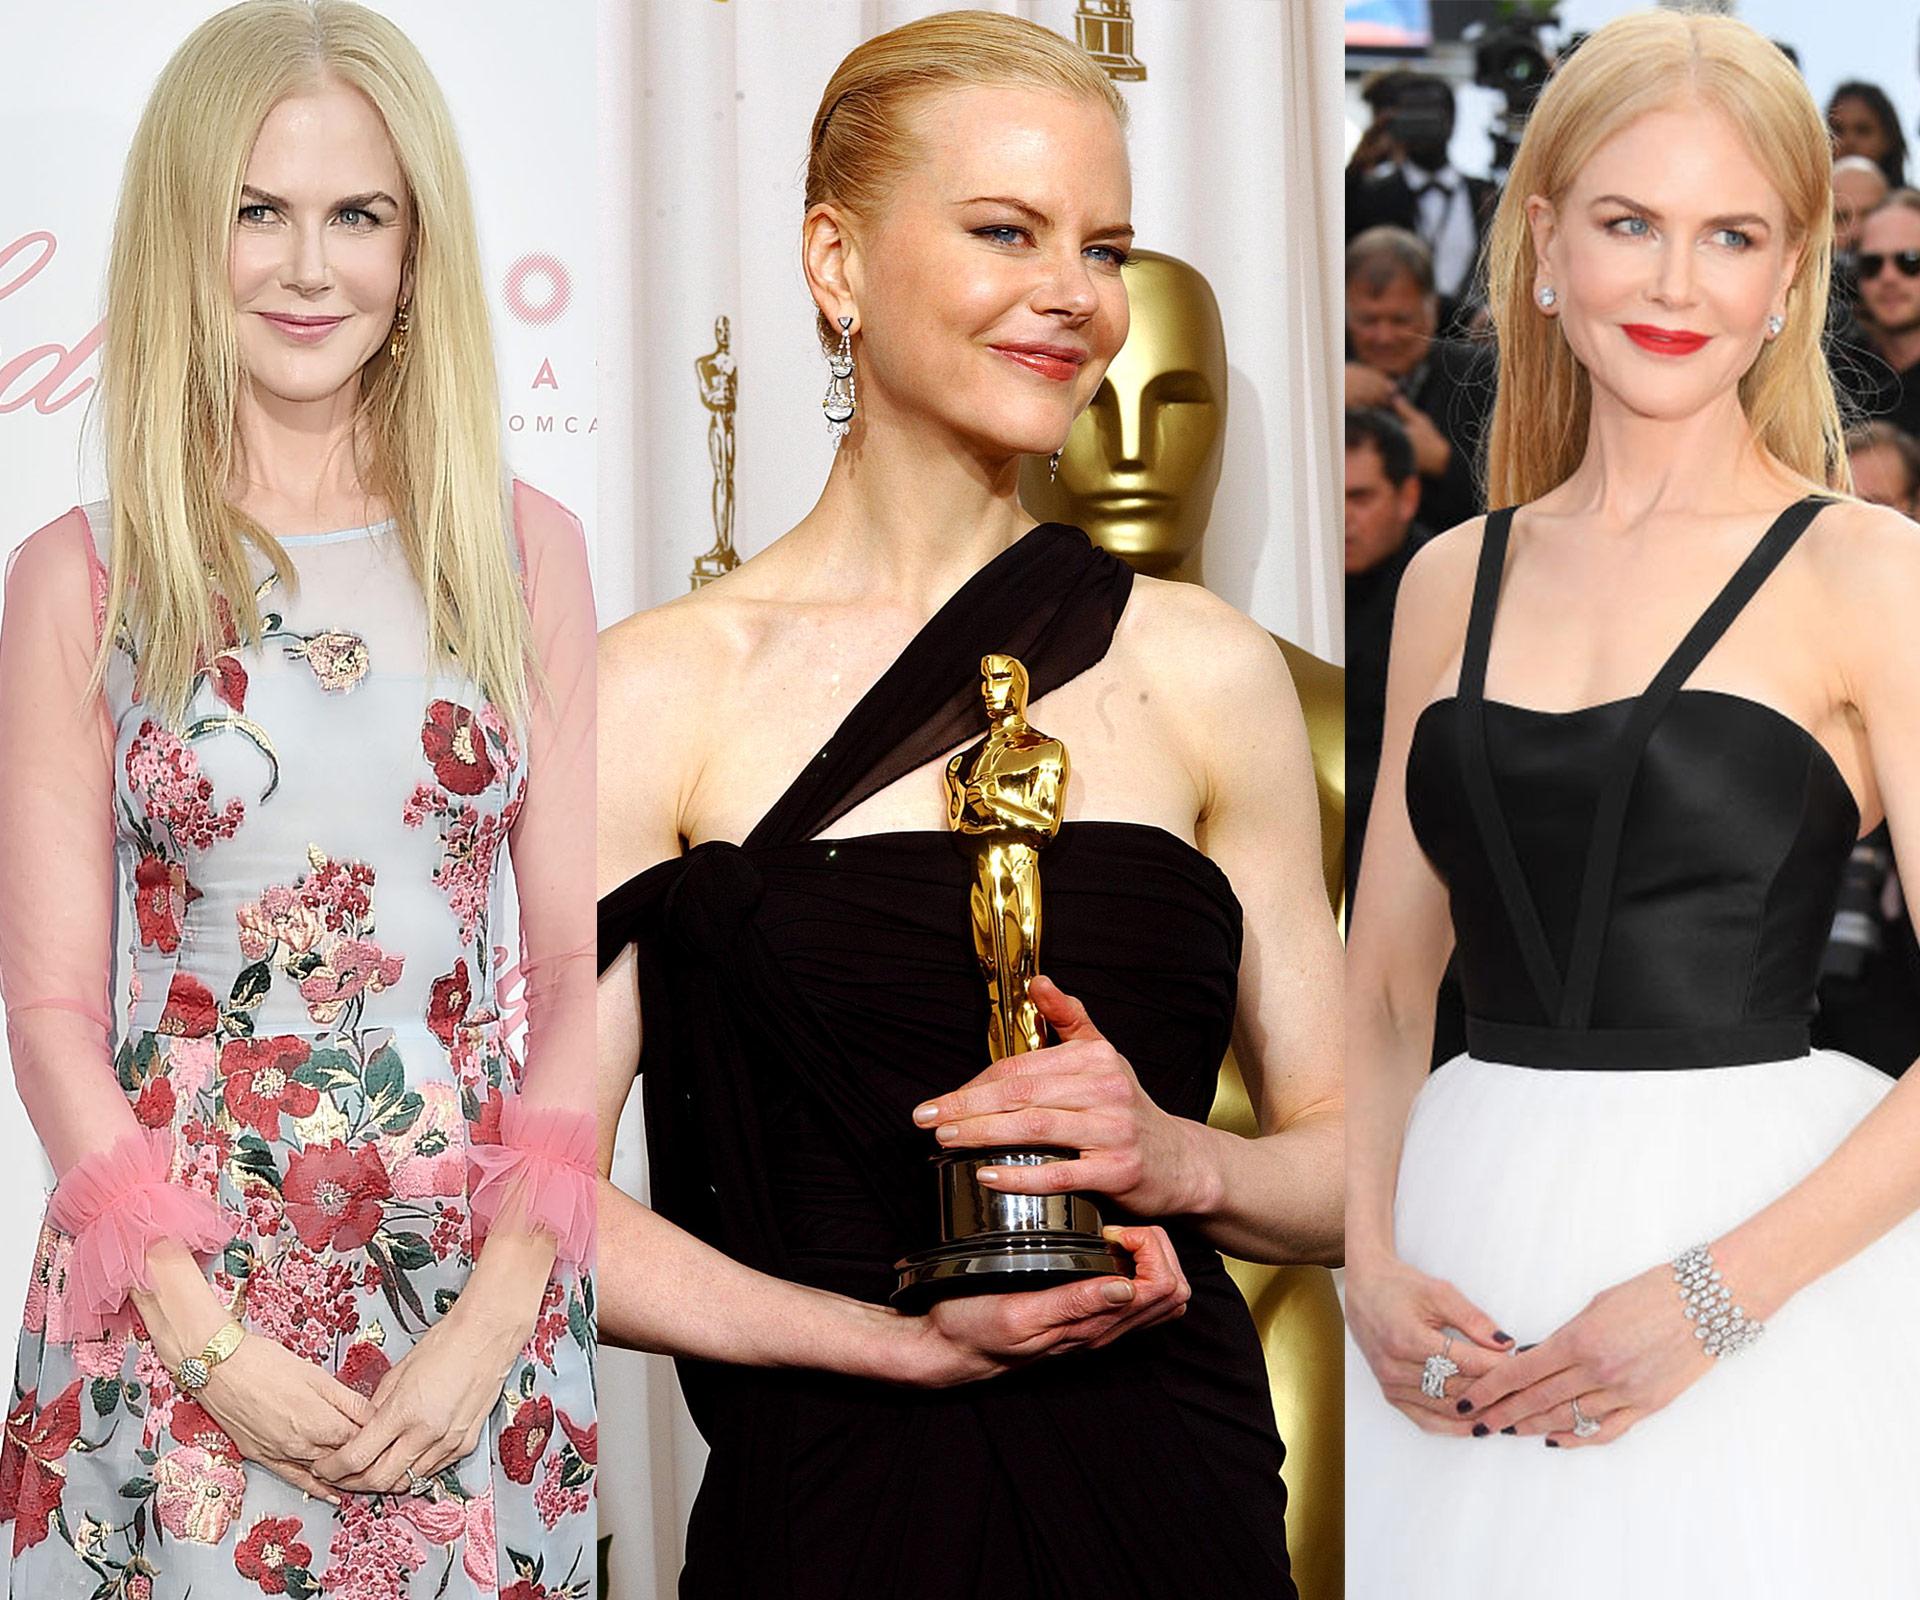 Nicole Kidman at 50: I still act like 'a 21-year-old'